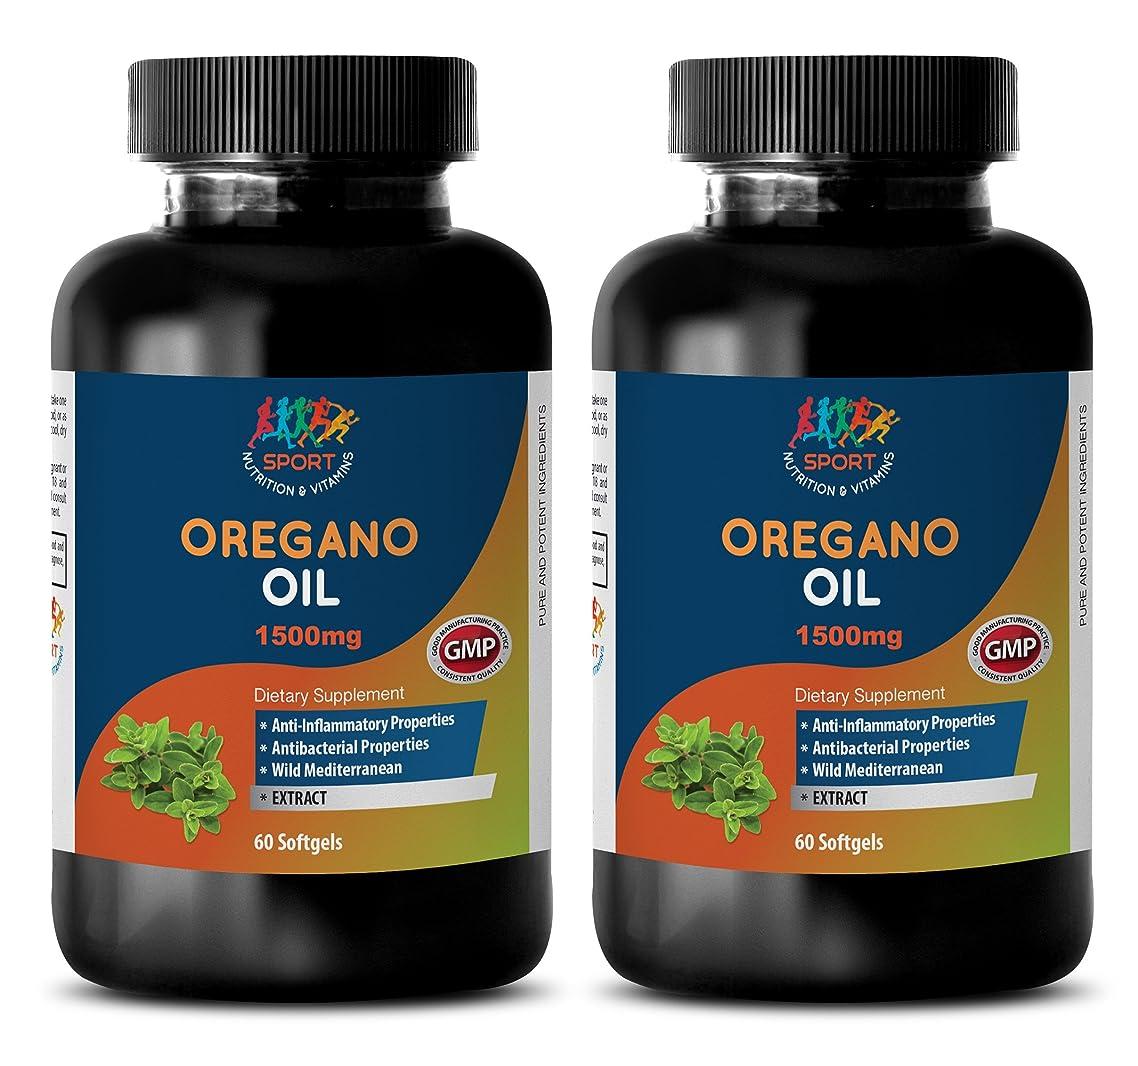 Antioxidant and immunity - OREGANO OIL EXTRACT (1500mg) - Oregano oil super strength p73 - 2 Bottles 120 Softgels